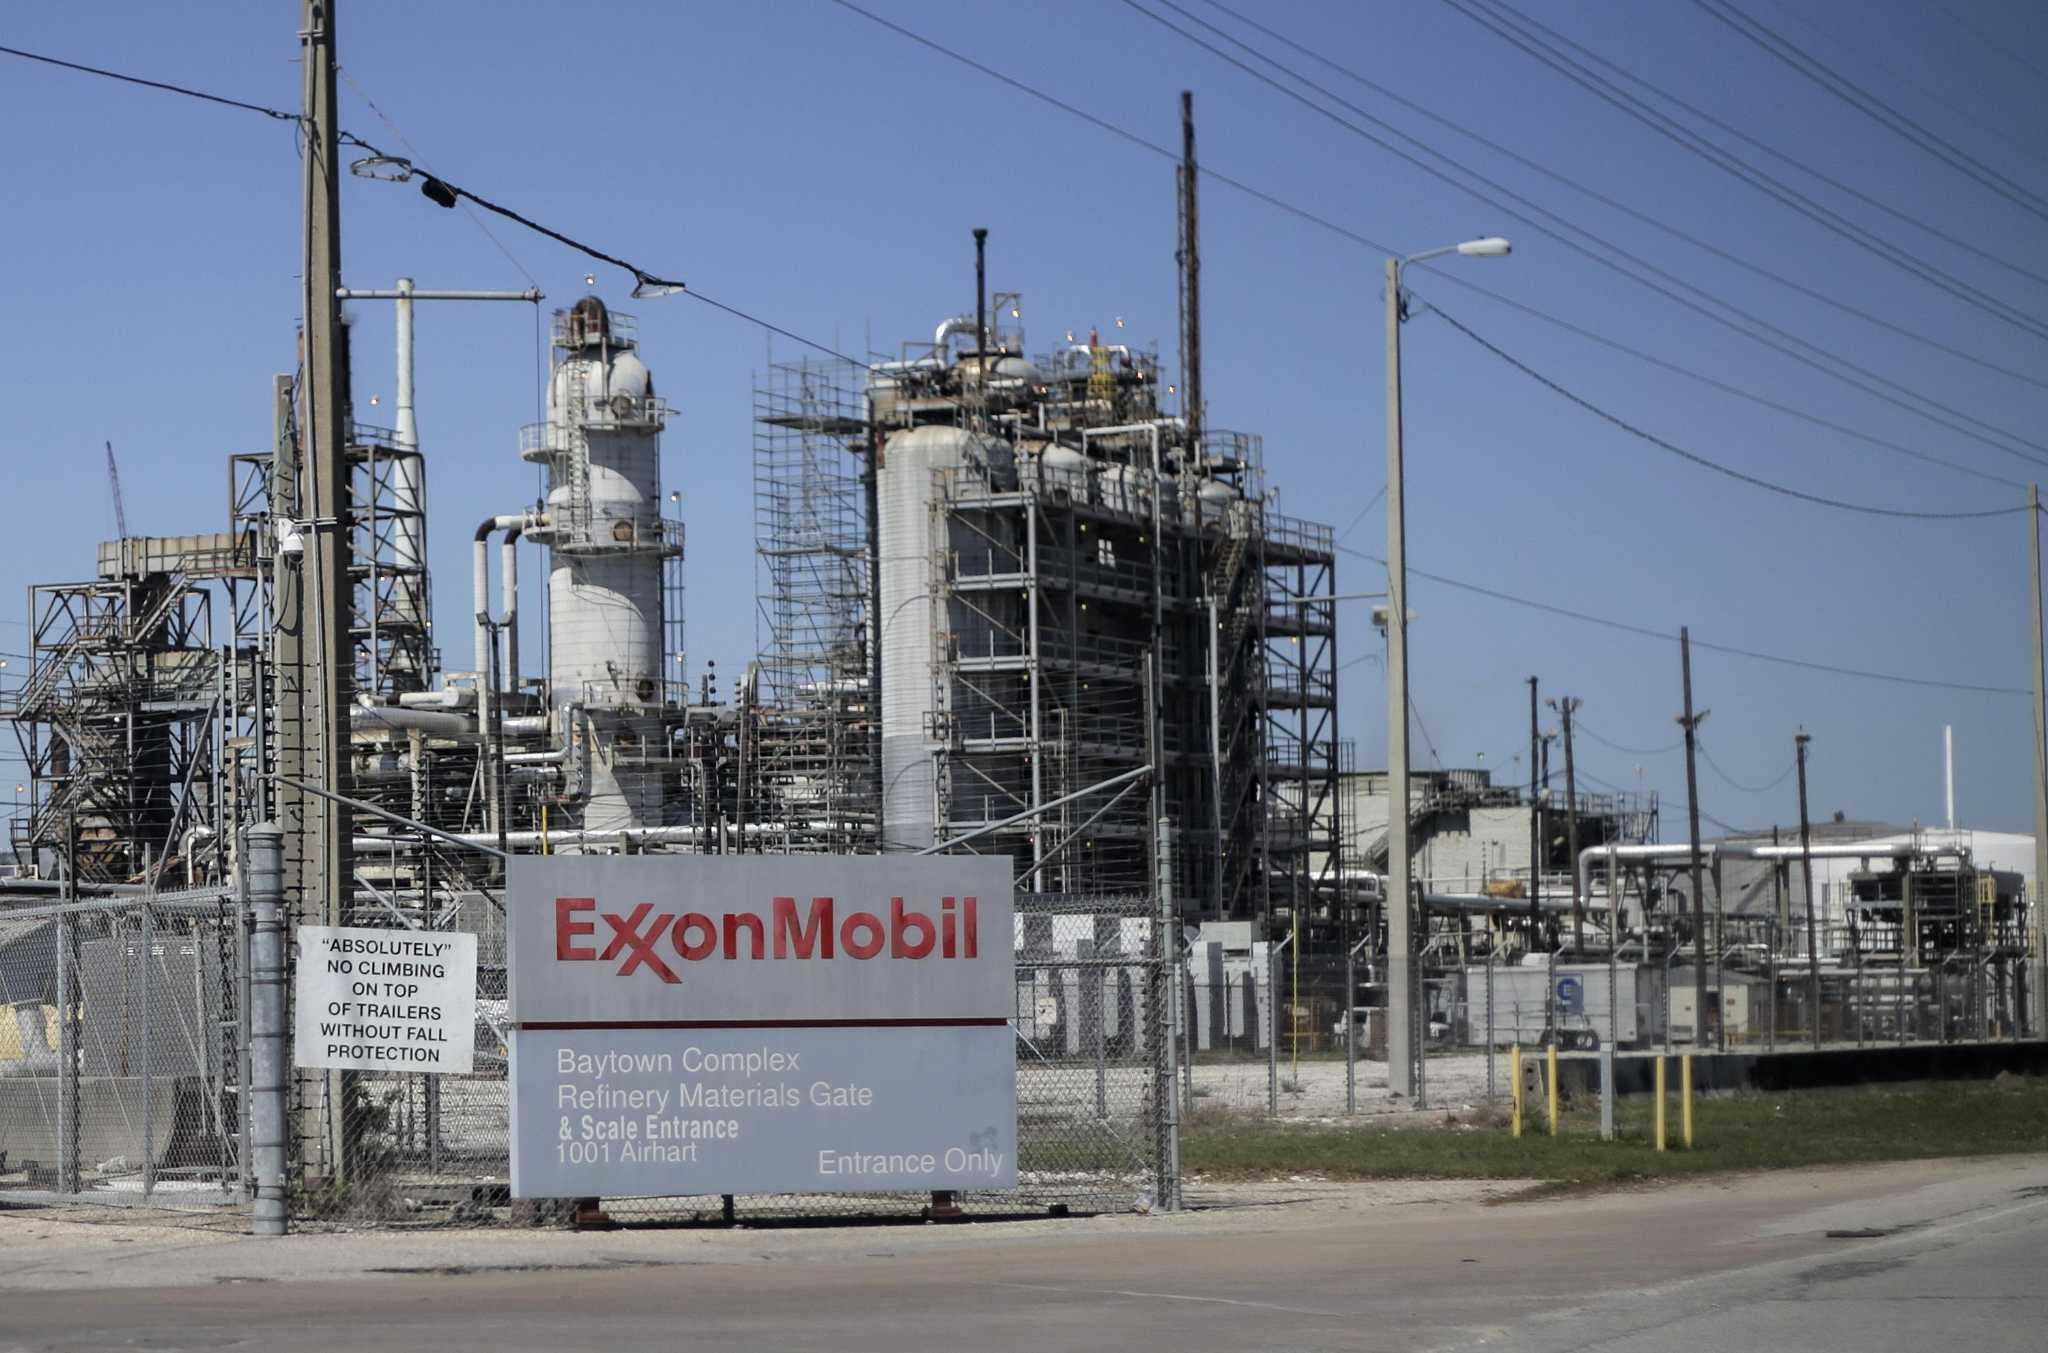 Exxon Mobil planning $1 9 billion expansion at Baytown